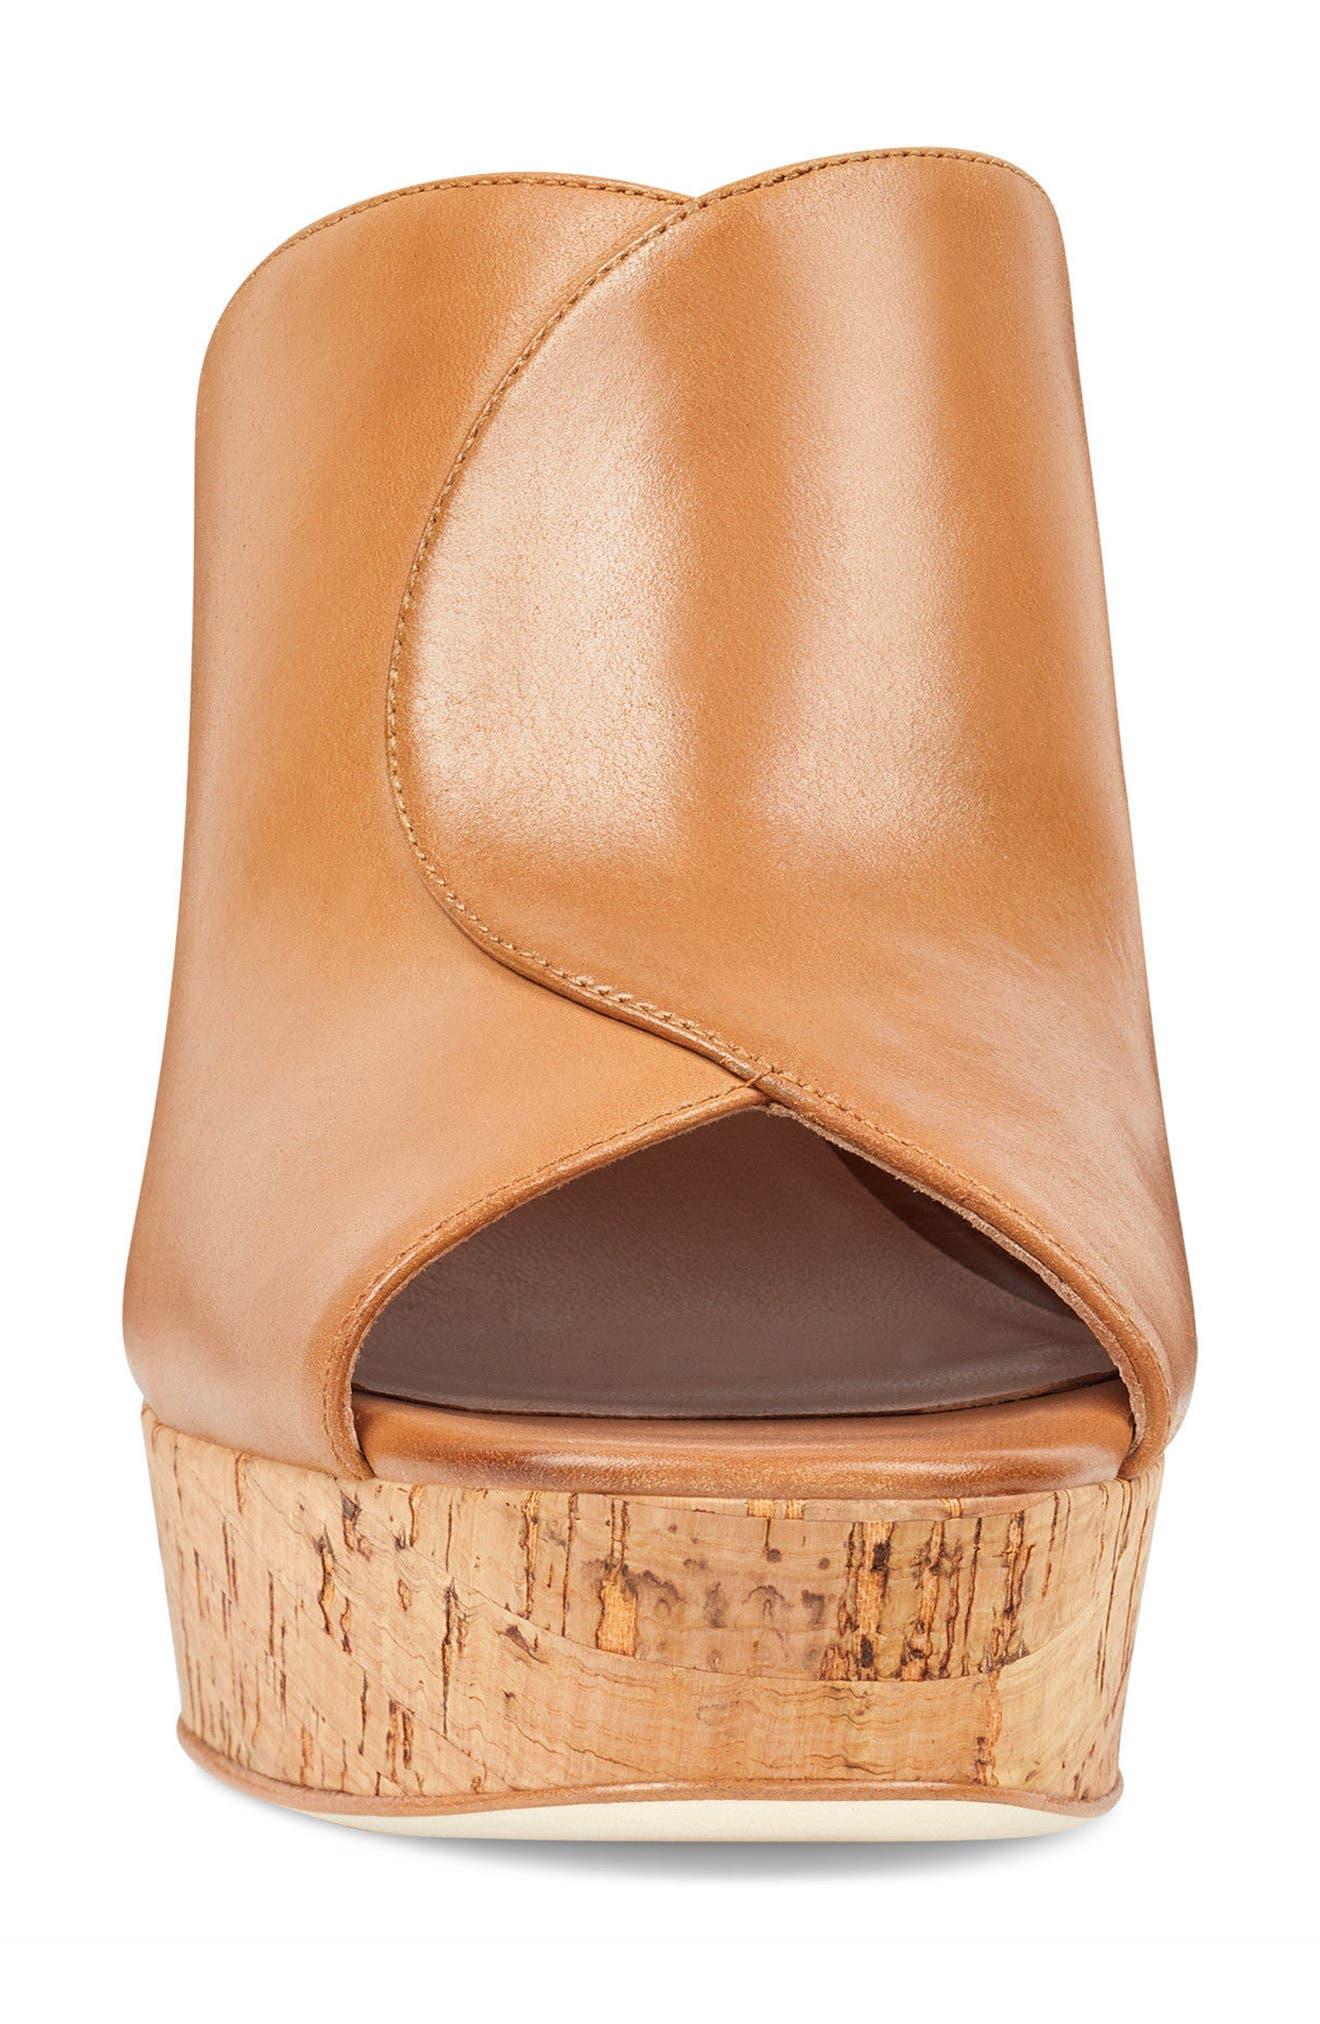 Lisana - 40th Anniversary Capsule Collection Platform Slide Sandal,                             Alternate thumbnail 4, color,                             Dark Natural Leather